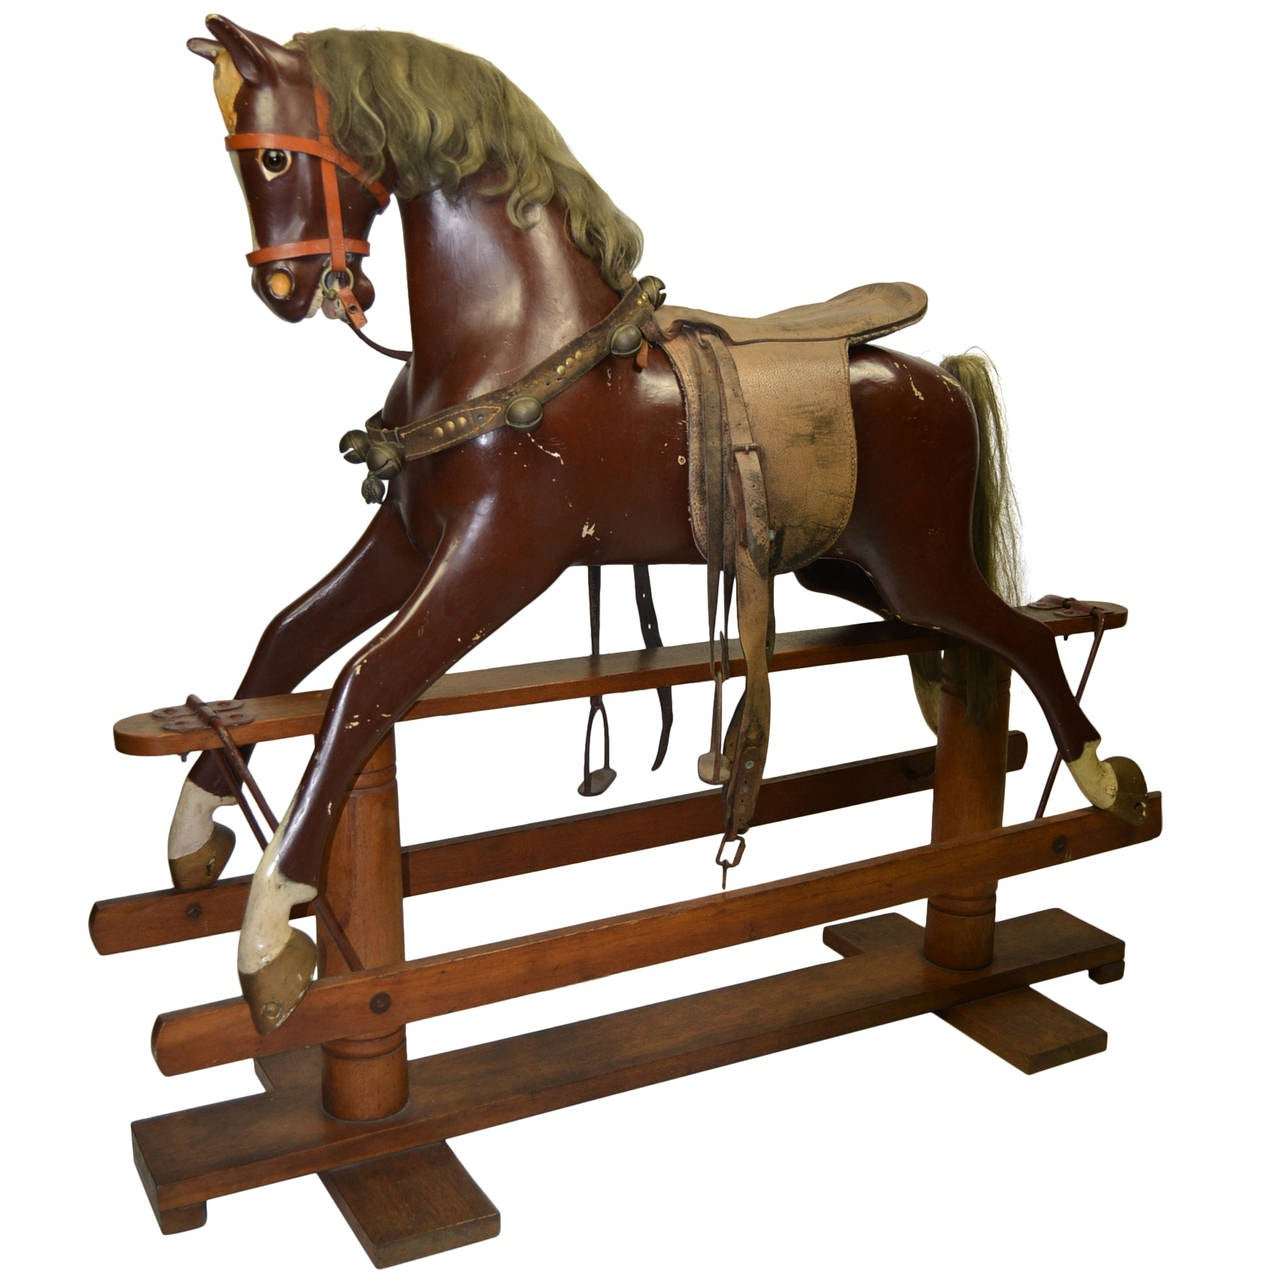 Antique Large Rocking Horse on Wooden Base